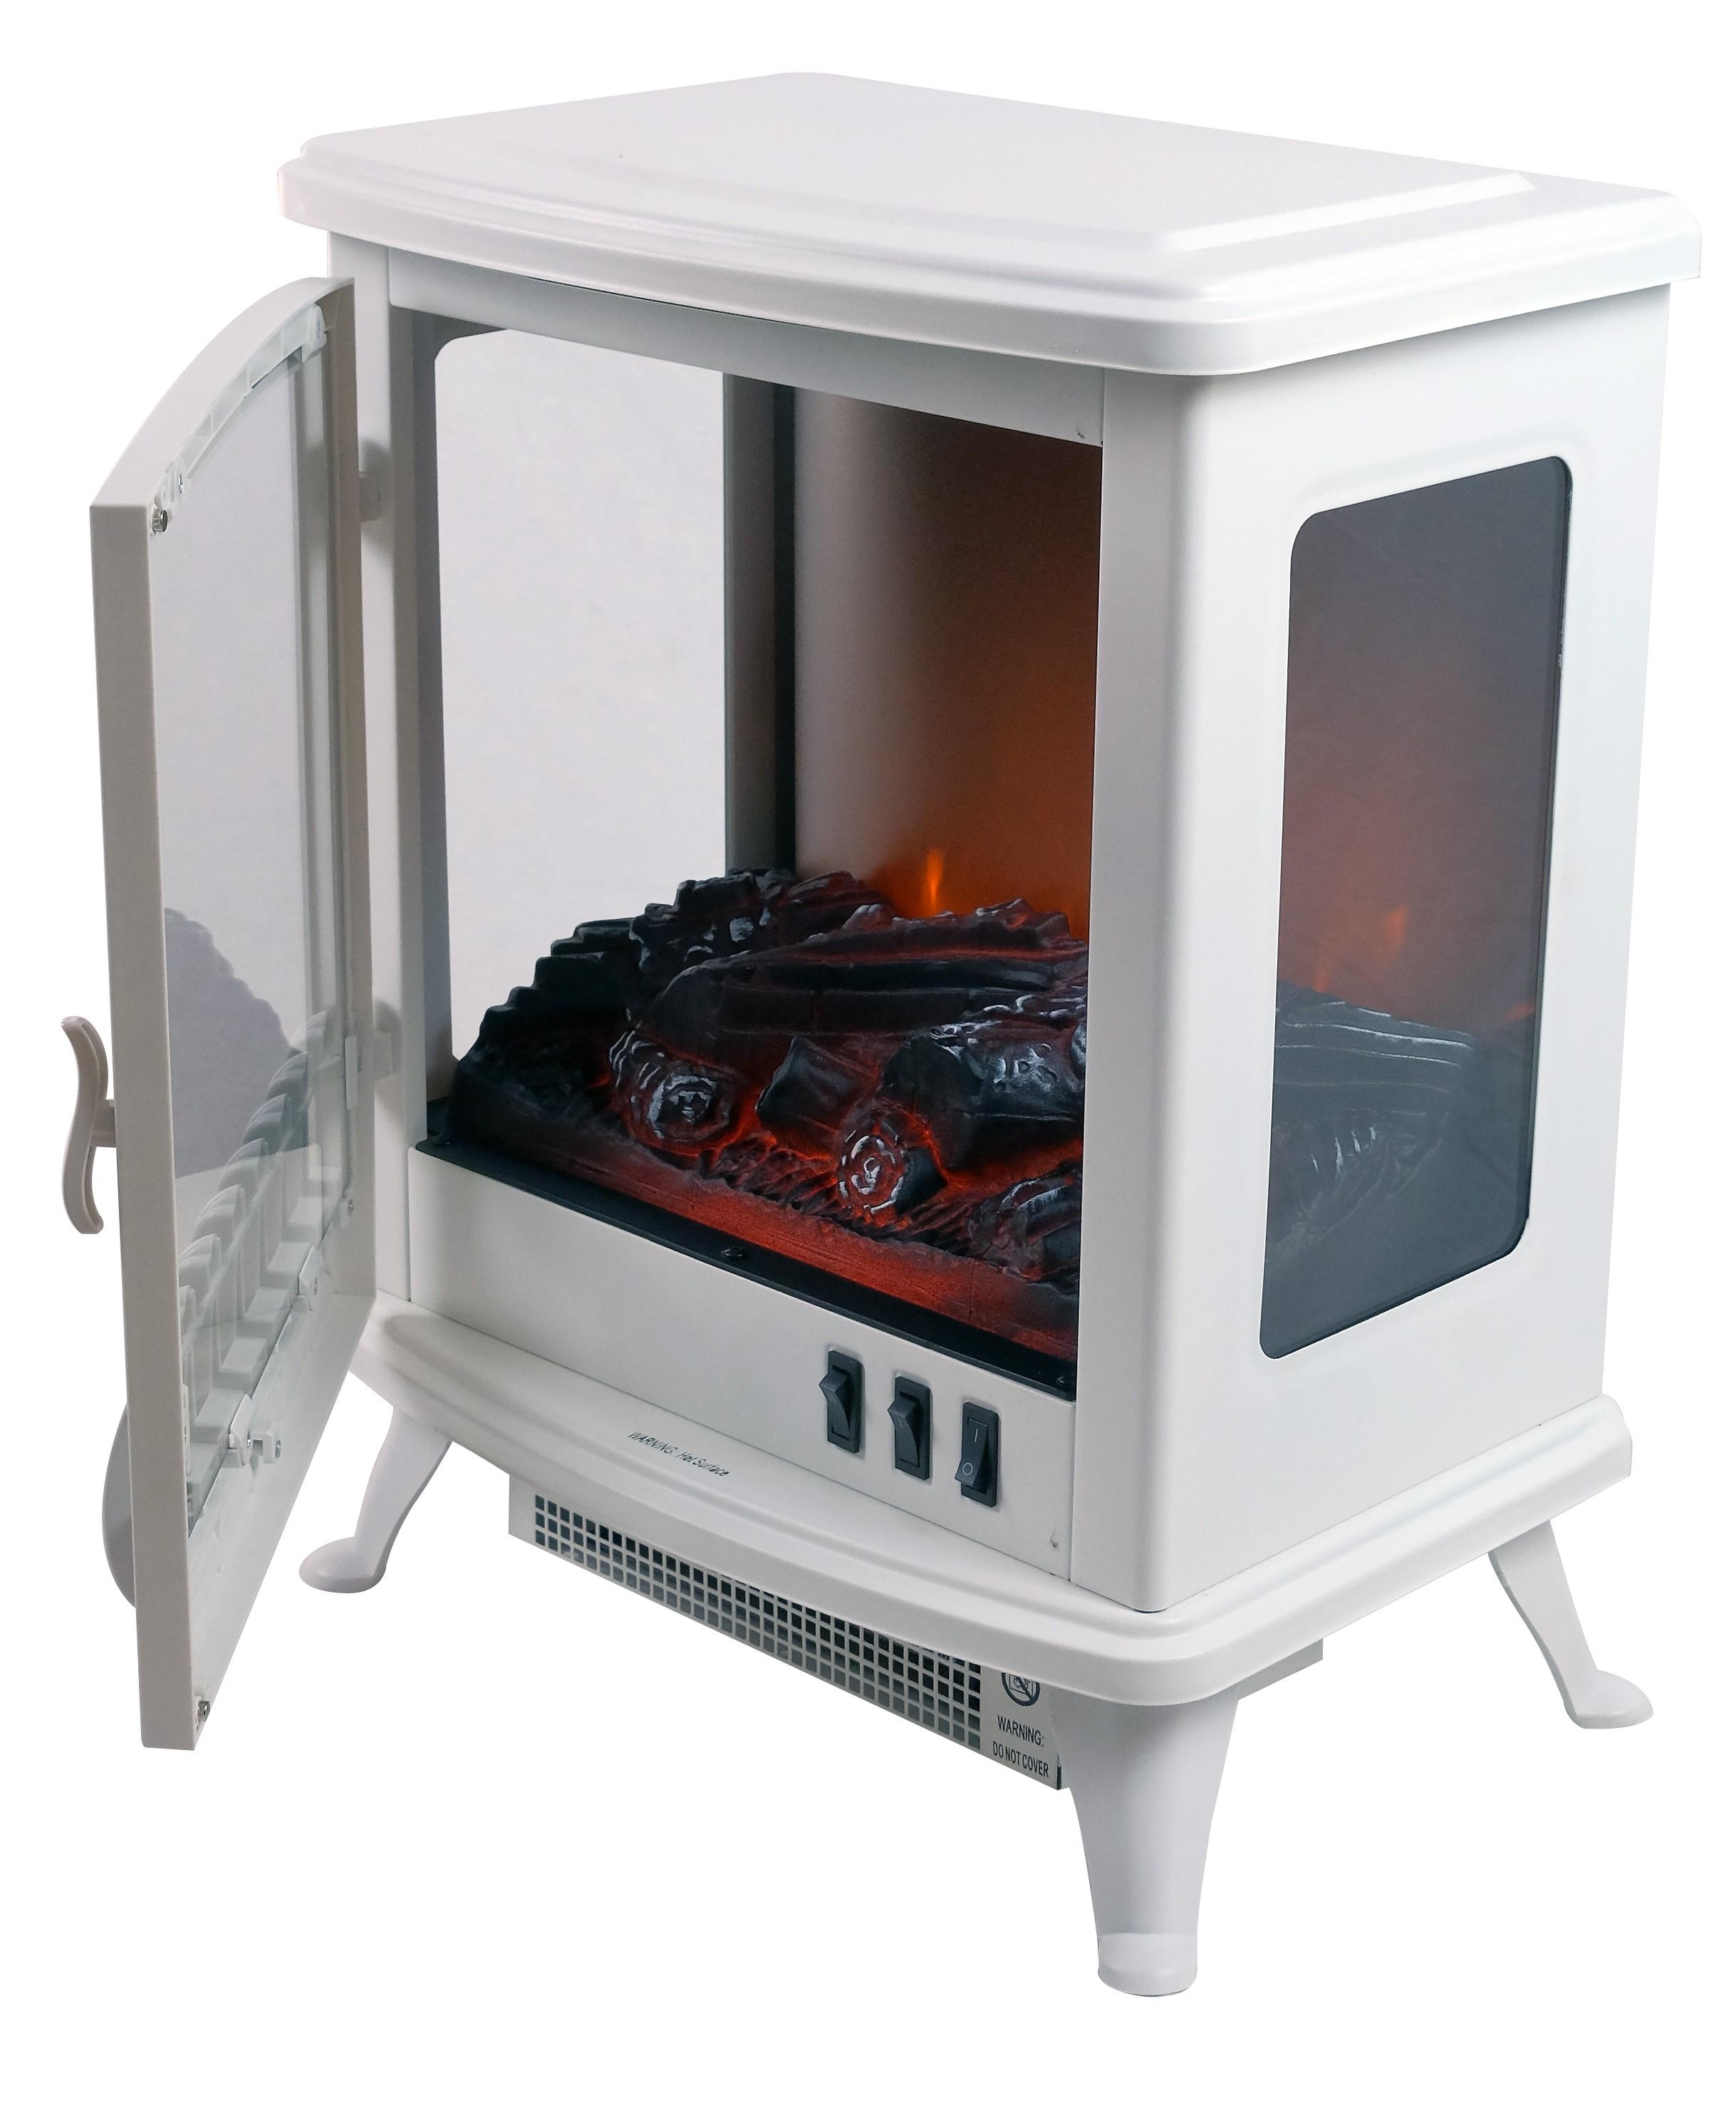 chemine electrique blanche grande chemine lectrique with